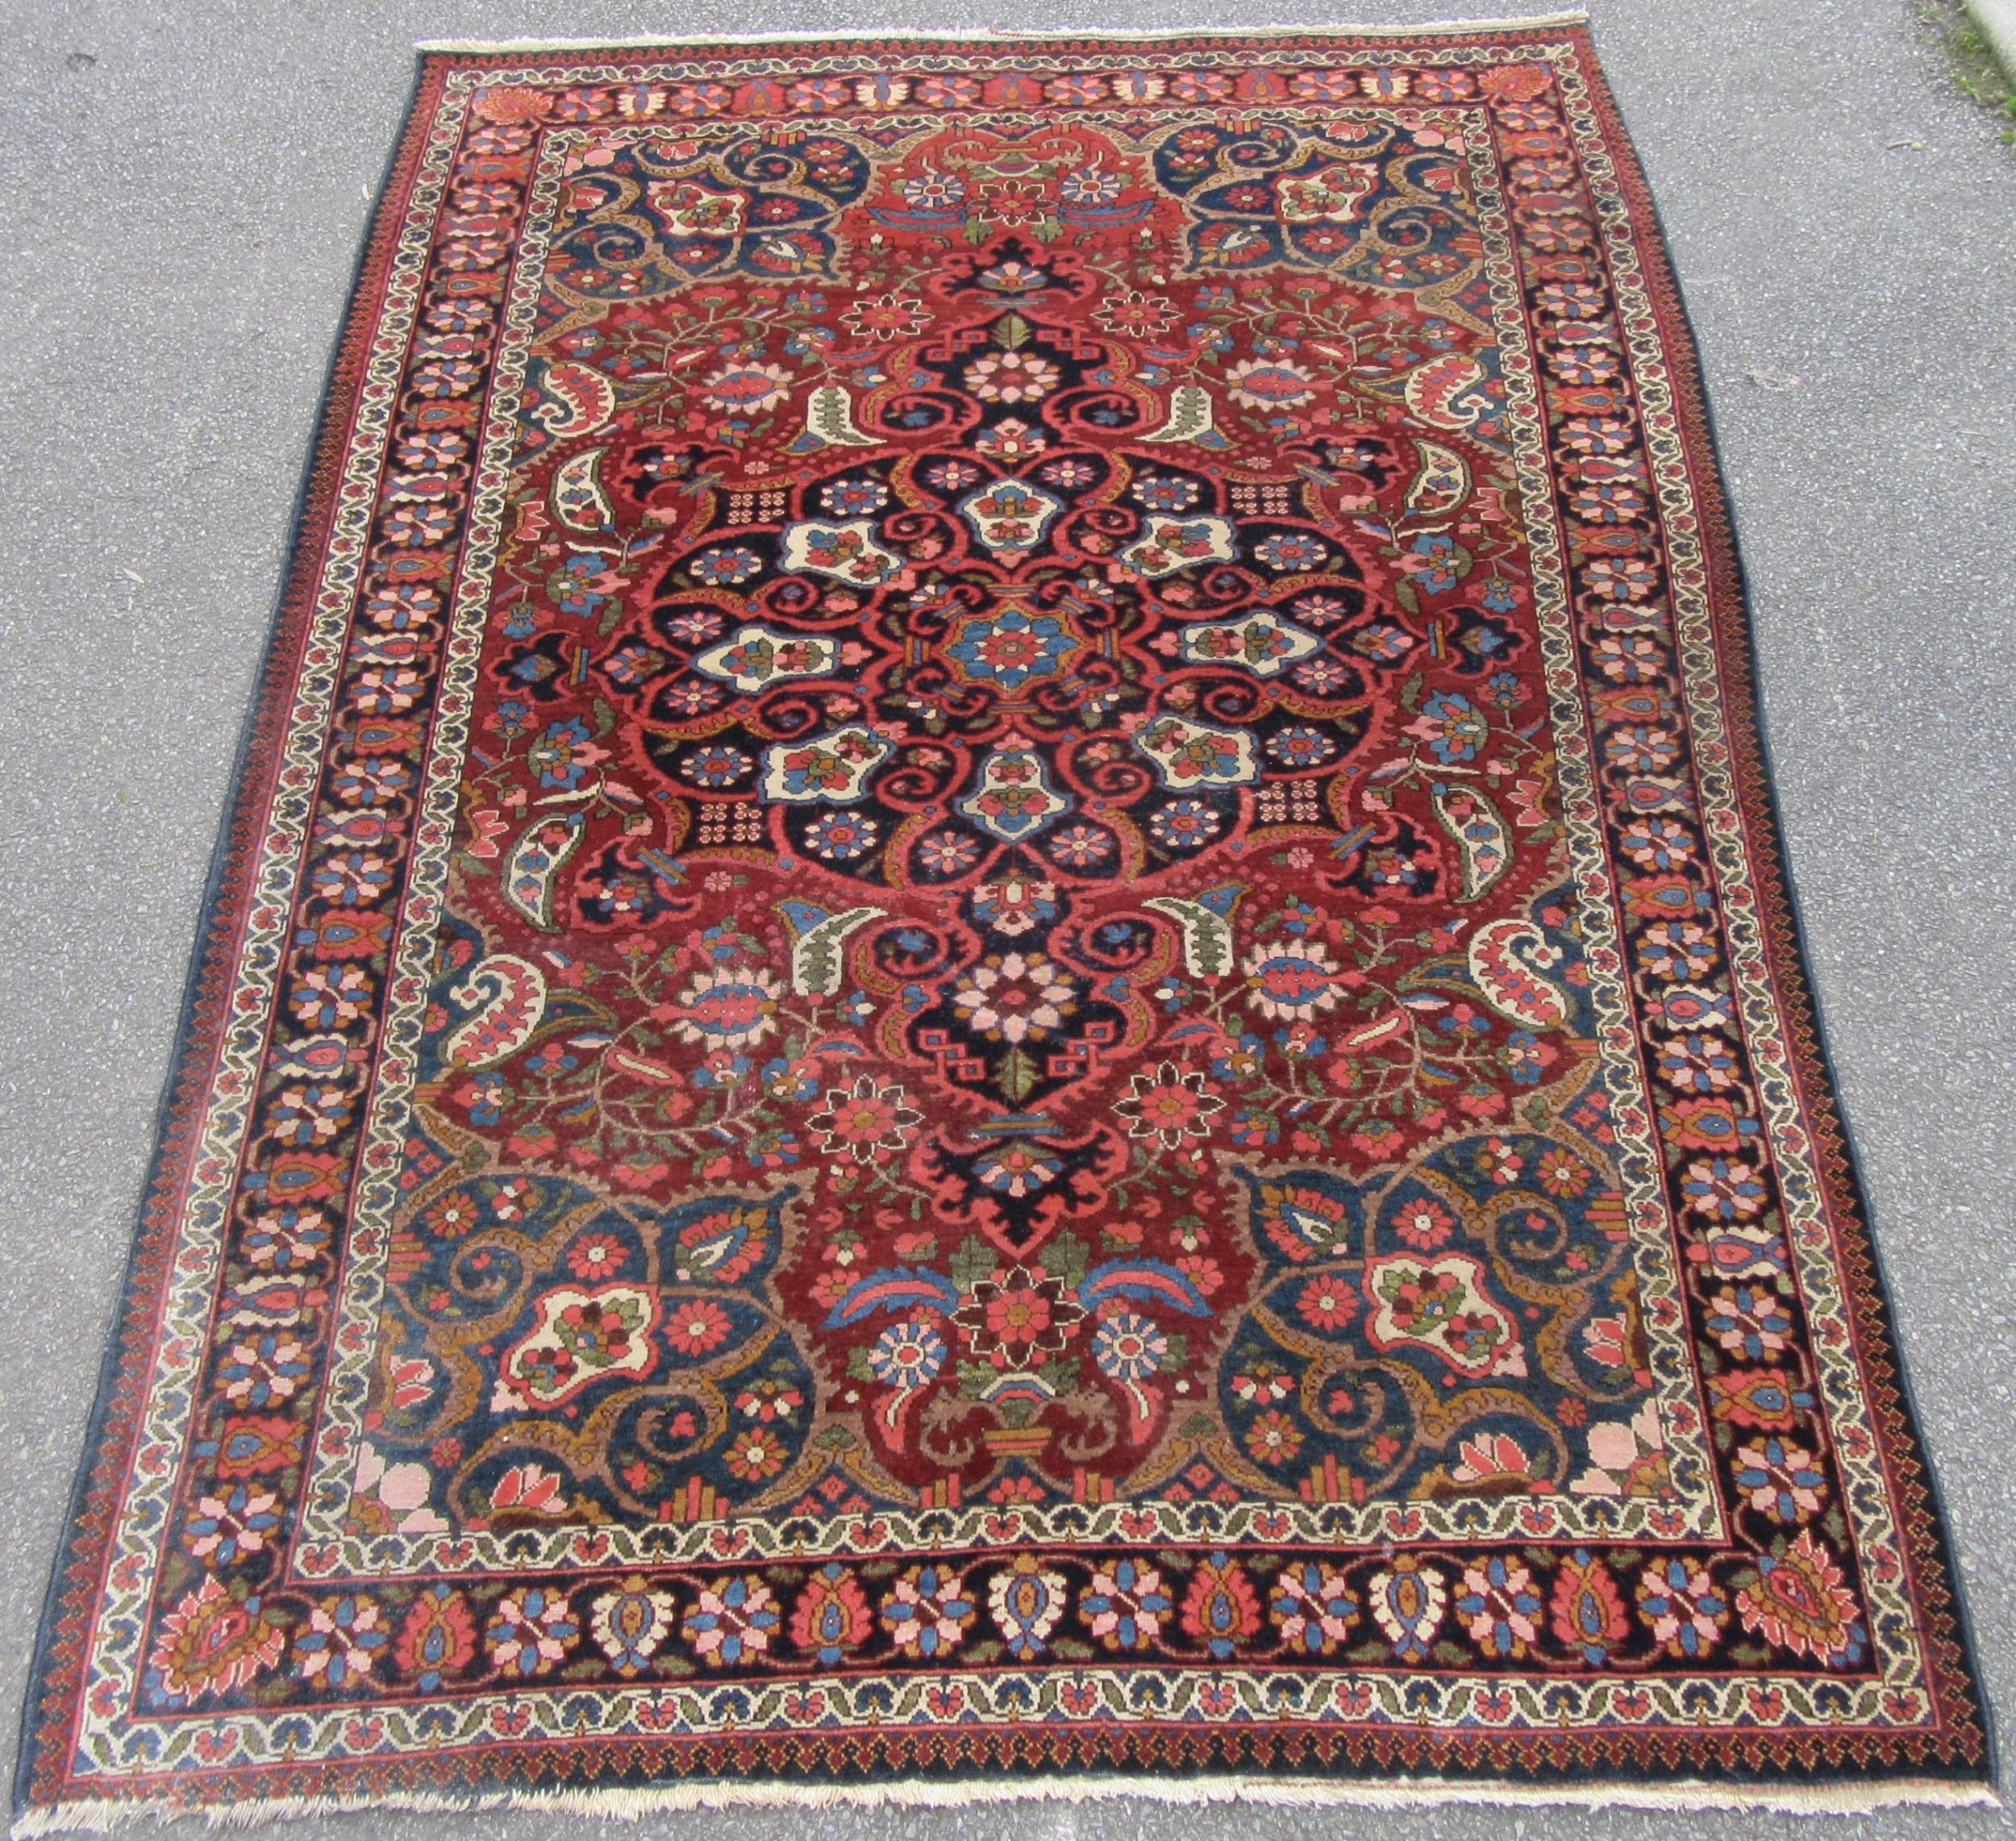 stunning fine antique persian kurdish bakhtiari rug carpet over 10 colours used in the weave